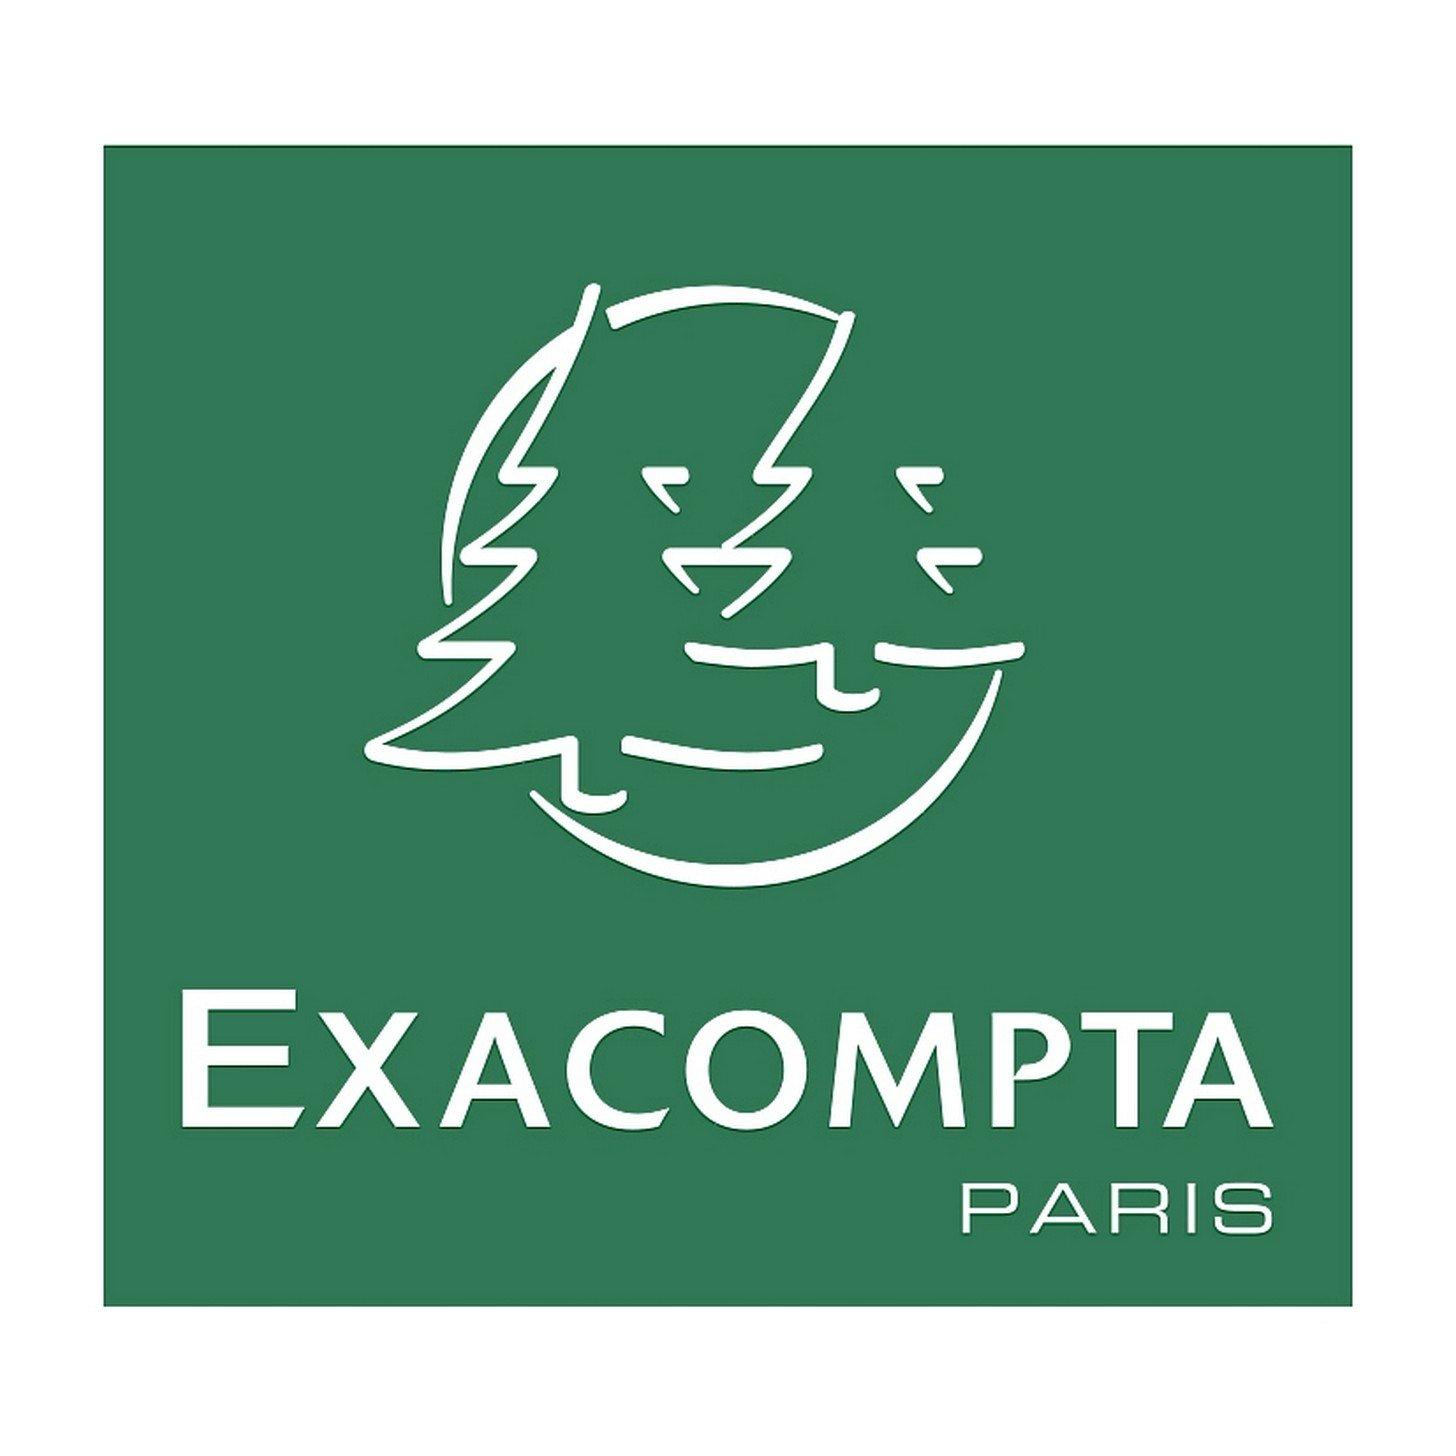 24x31.5 cm Nero Exacompta 85334E Portalistini